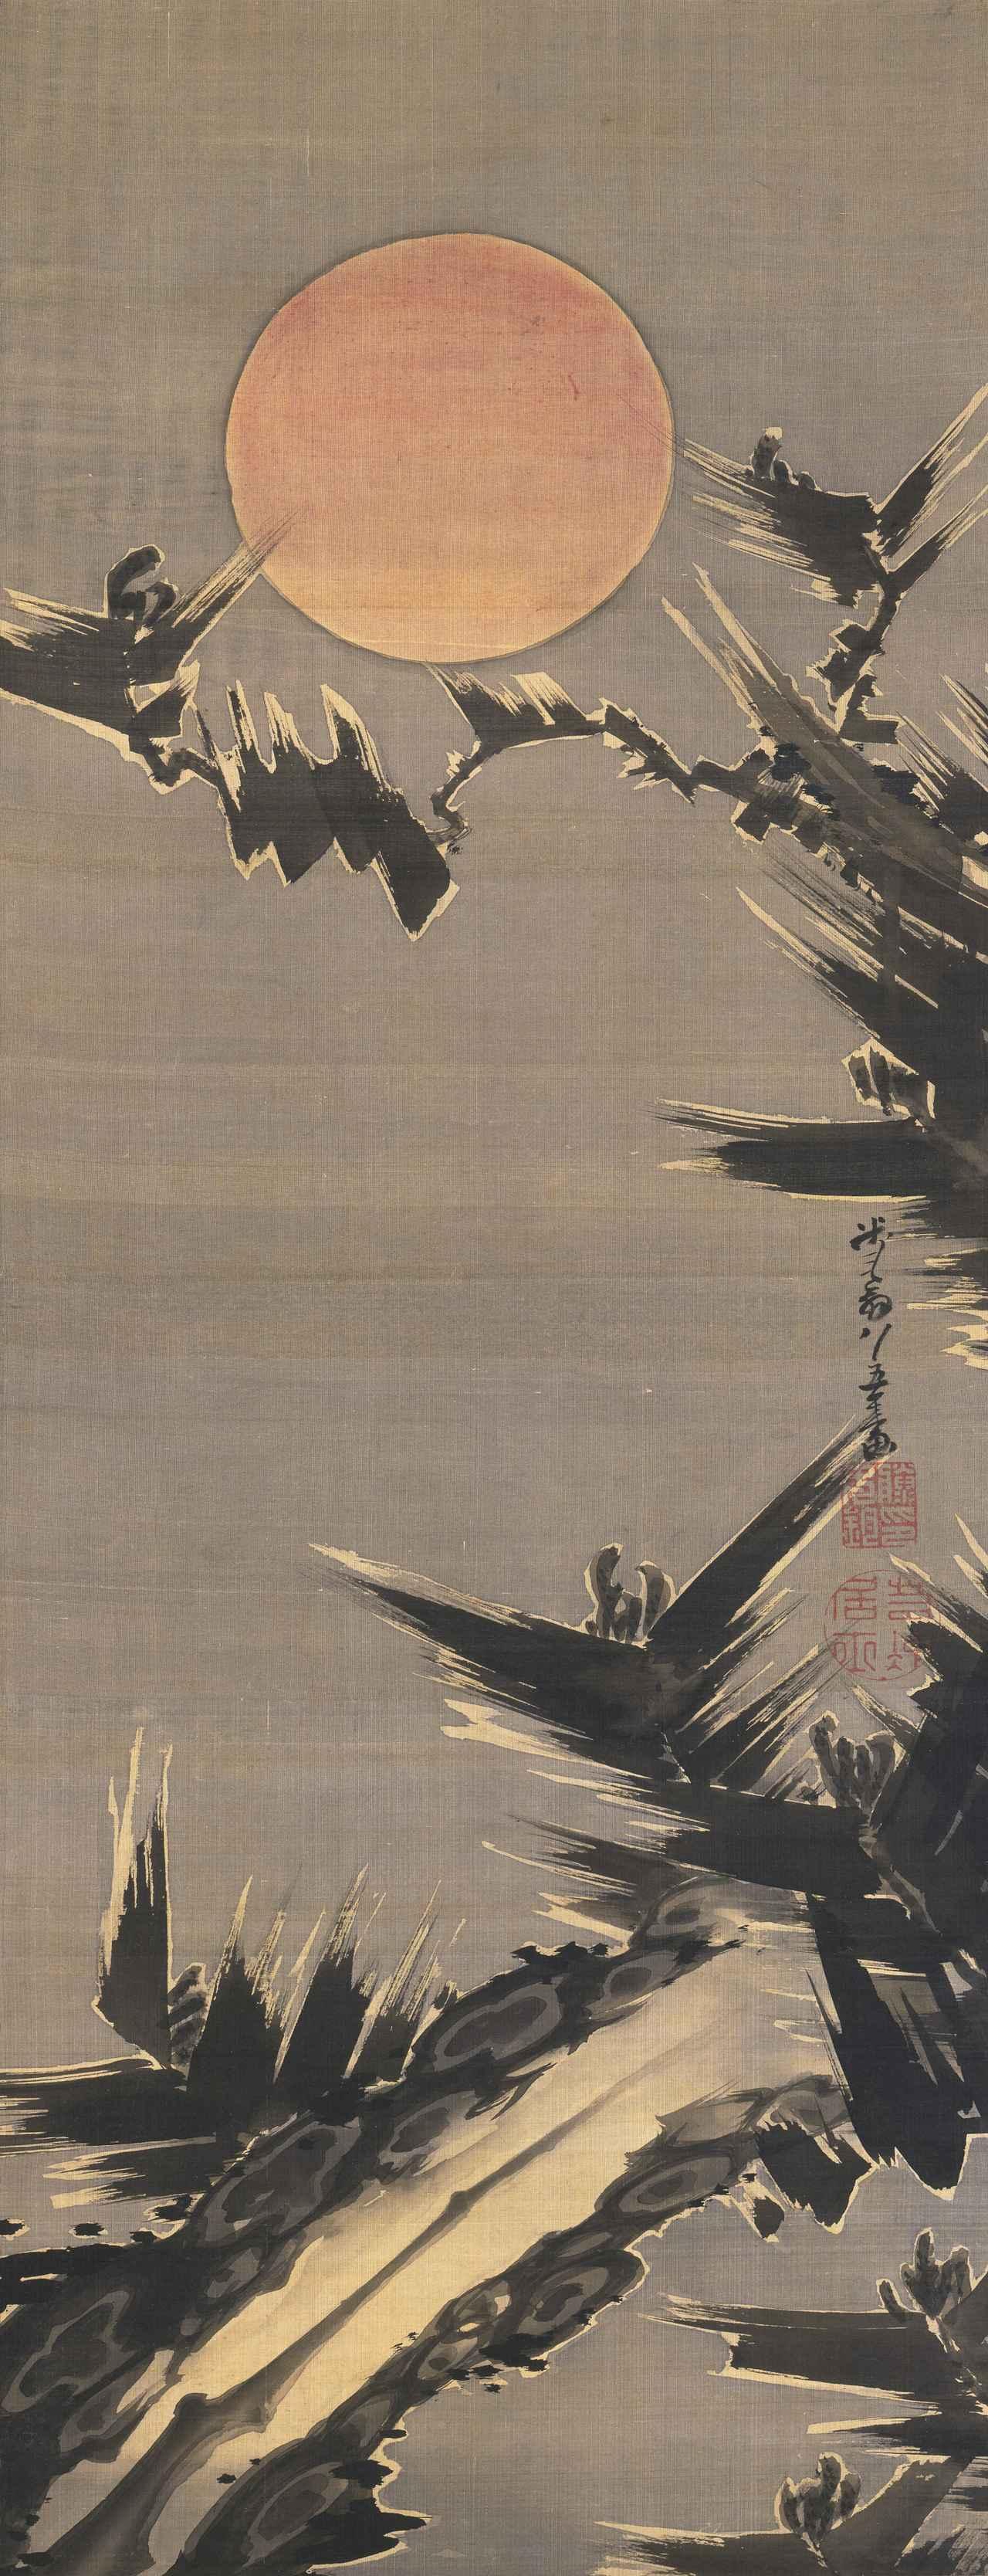 画像: 旭日老松図 伊藤若冲 一幅、紙本墨画淡彩 101.6×38.9cm 江戸時代、寛政12年(1800) Gift of the Clark Center for Japanese Art & Culture Photo: Minneapolis Institute of Art